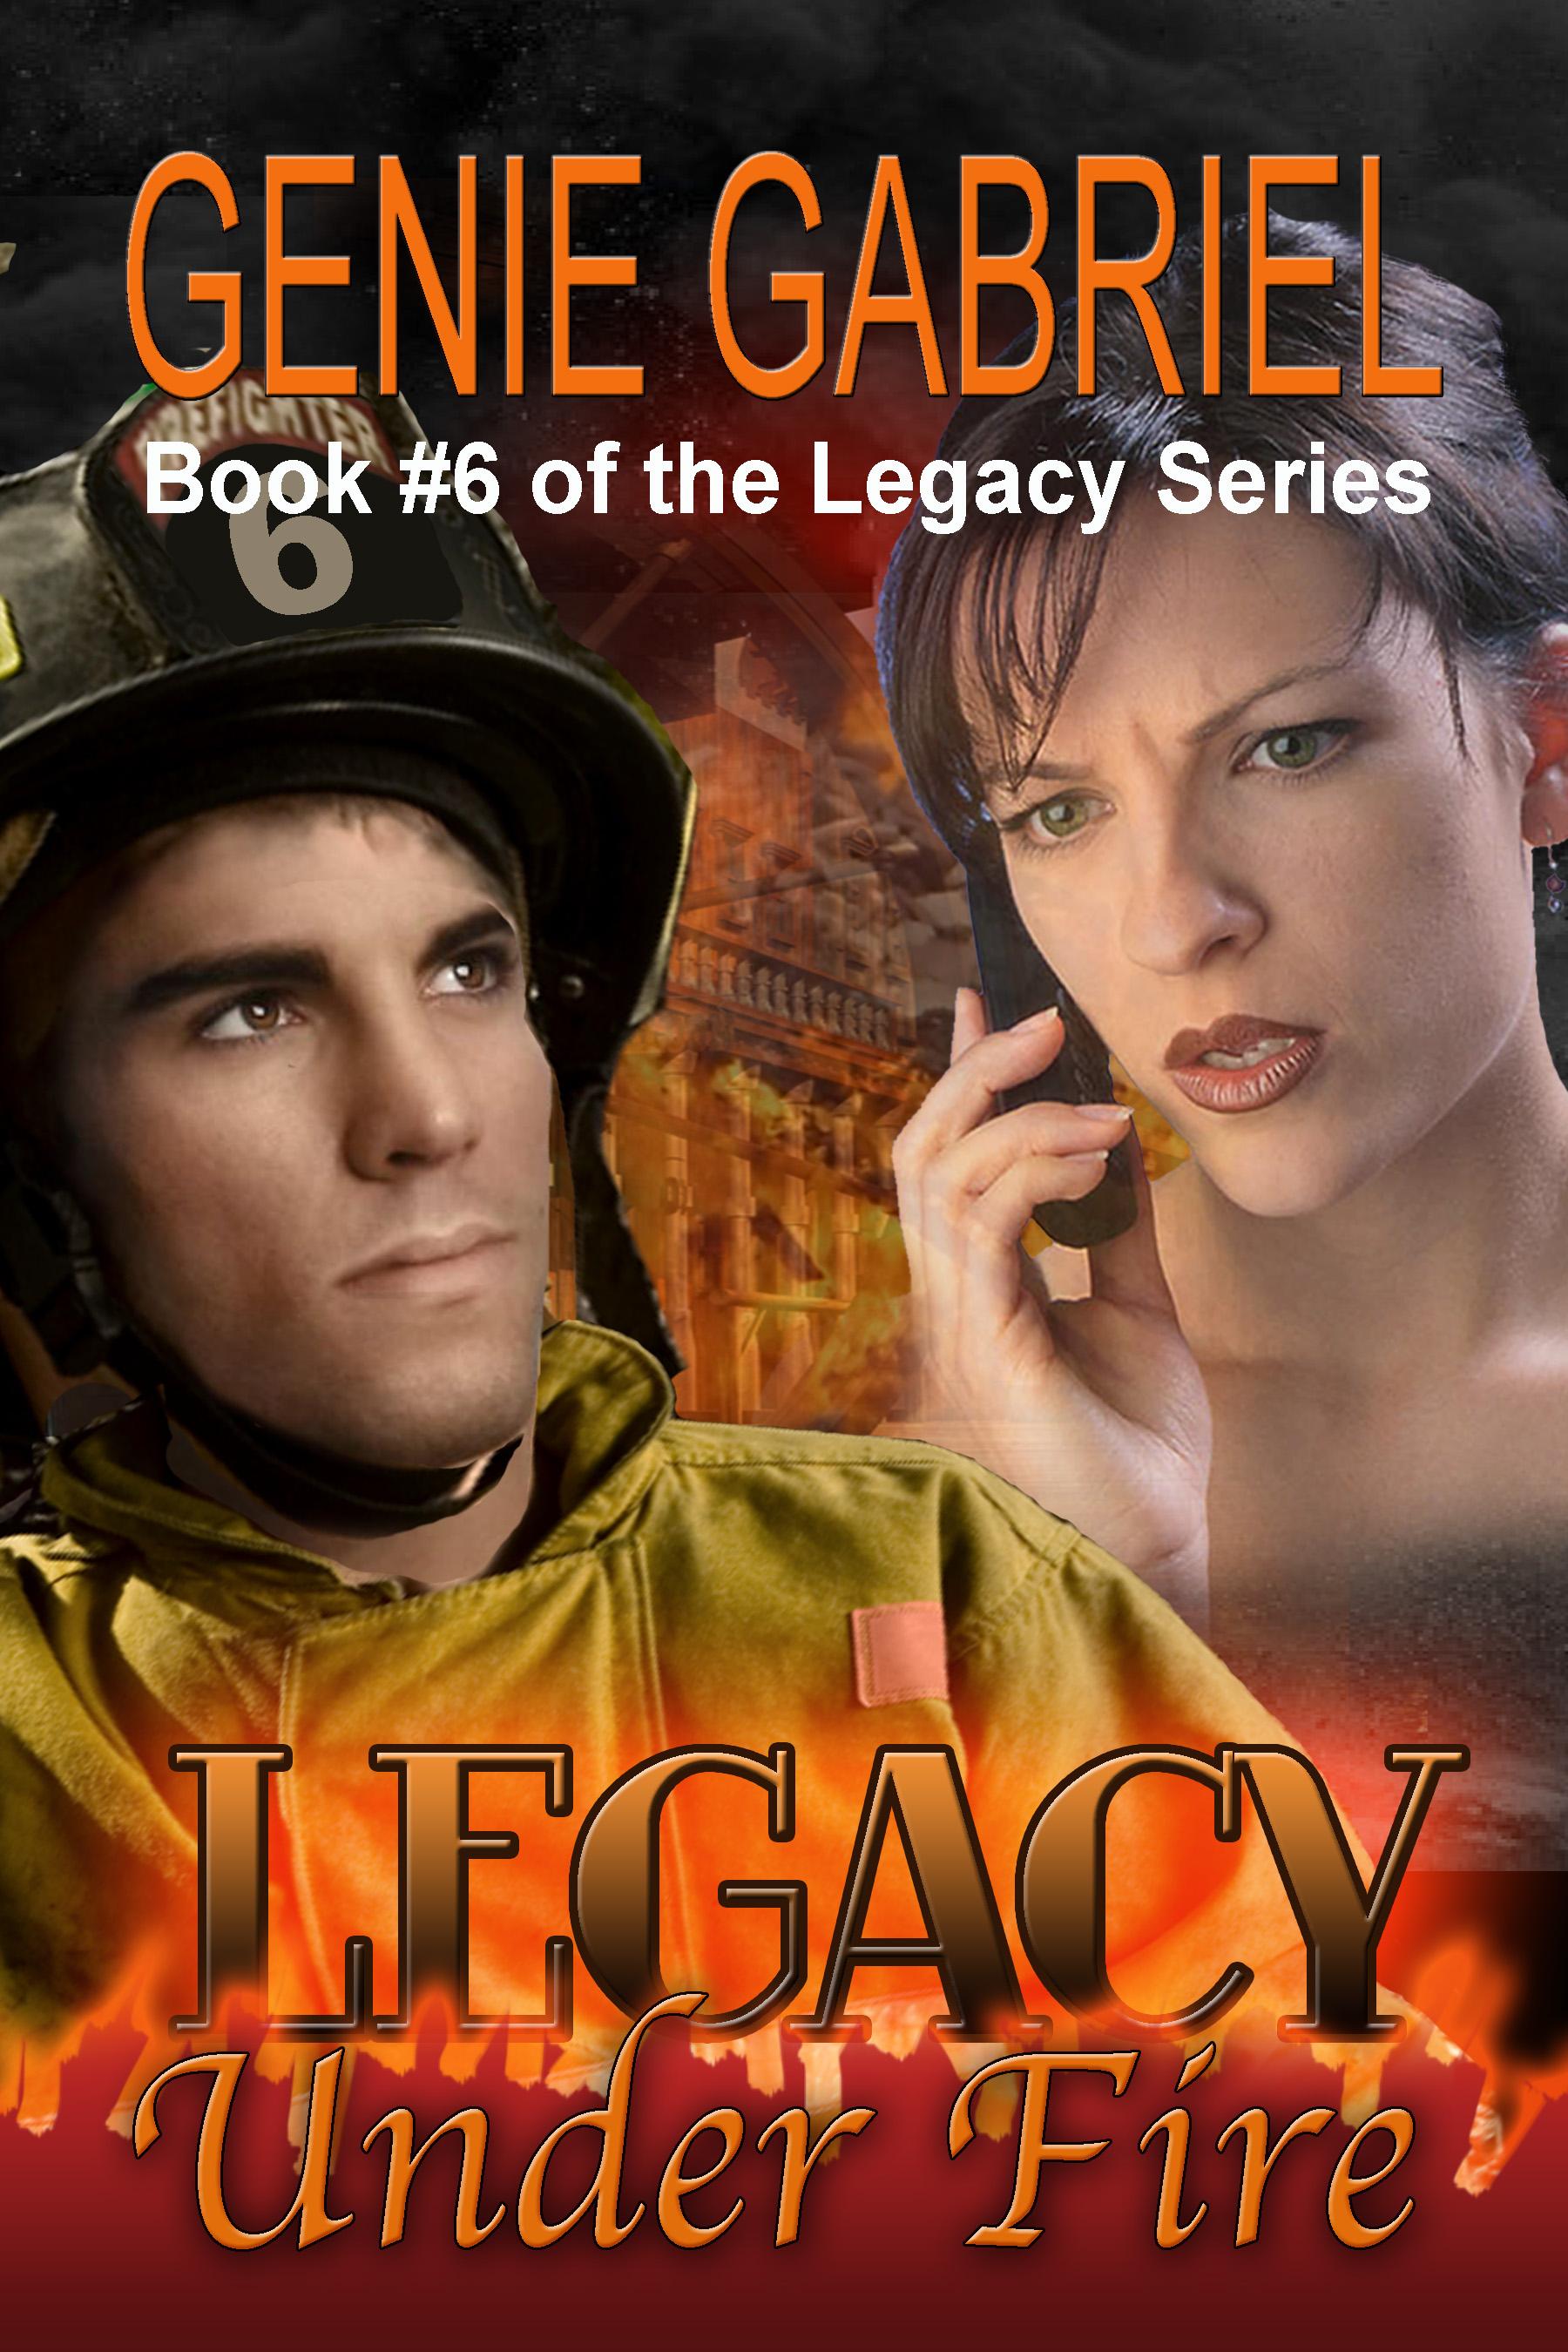 LegacyUnderFire